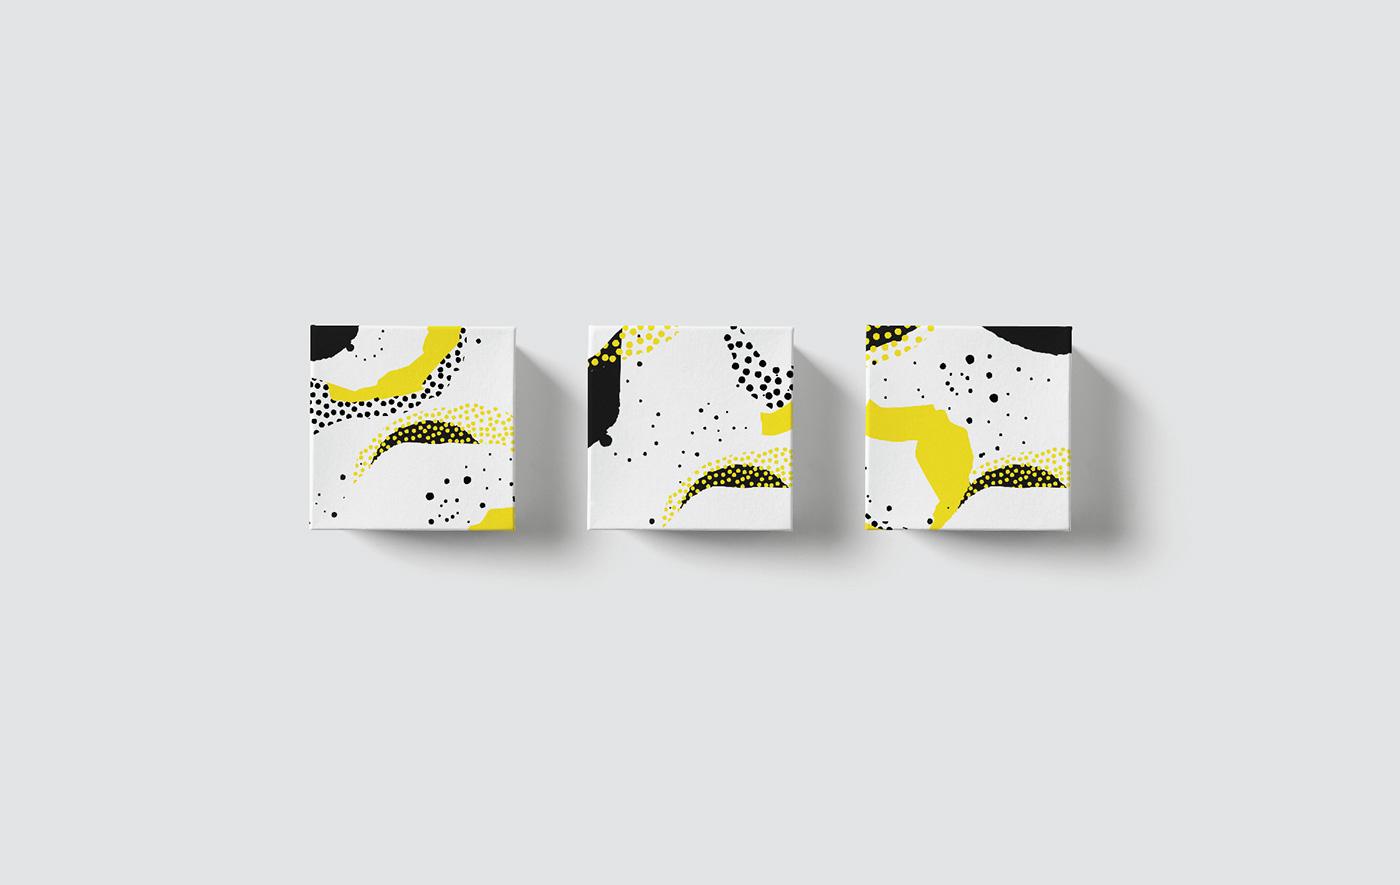 joya jewelry jewel Joyas brand identidad logo moda +fashion +branding